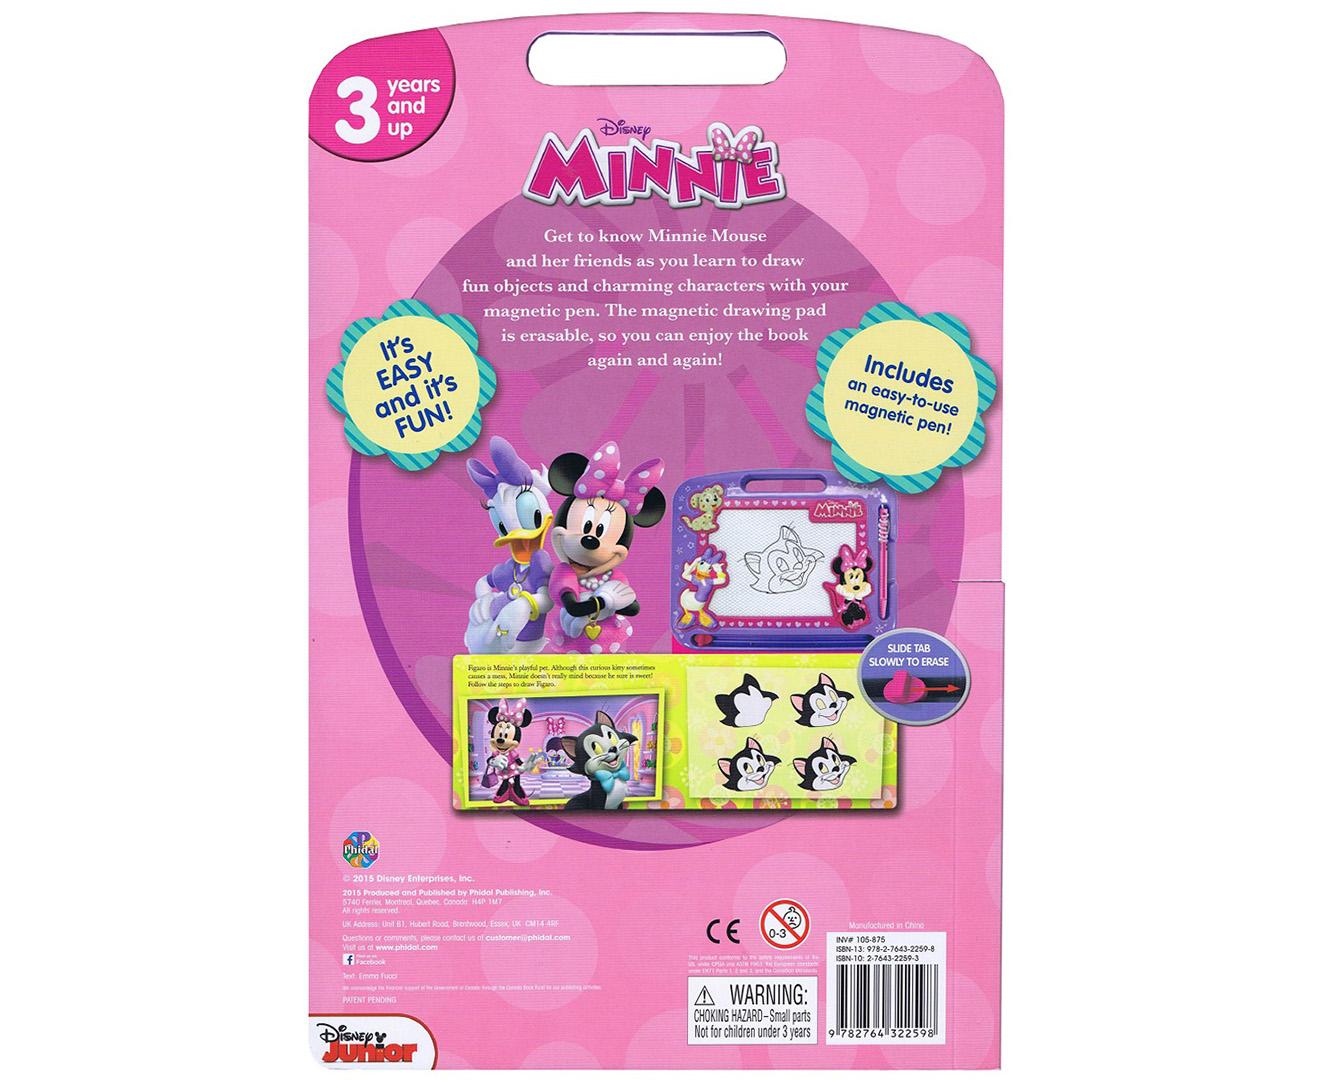 tiny minnie mouse Birkenstocks   #3 Bentleigh Lynn   Baby